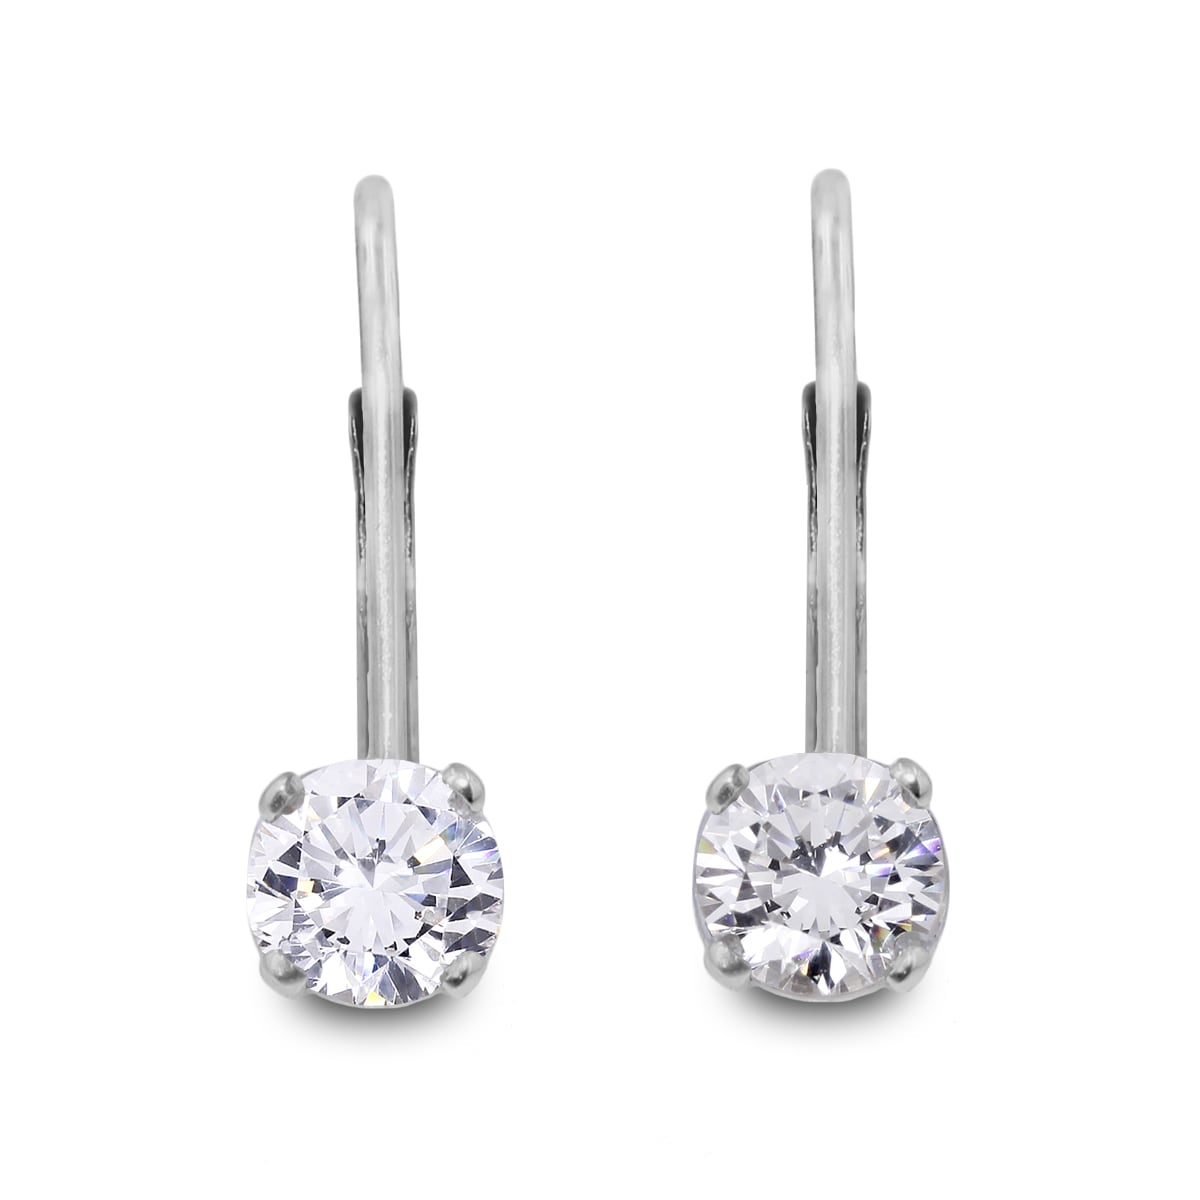 1 2 Carat Diamond Leverback Earrings In 14 Karat White Gold J K I2 I3 On Free Shipping Today 10909230